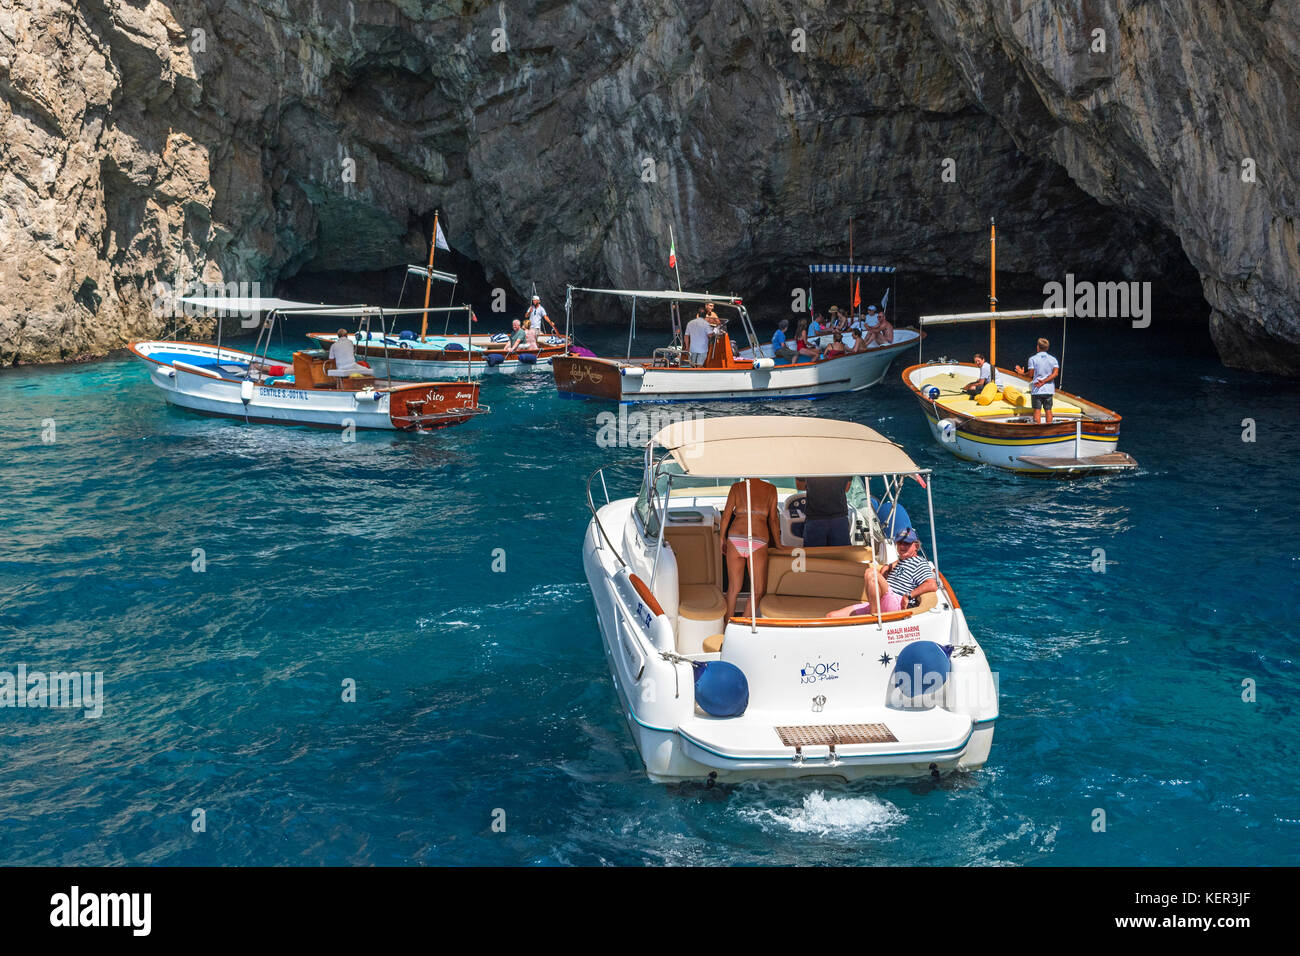 tourists on boat trips visit grotta verda on the island of capri, italy. Stock Photo